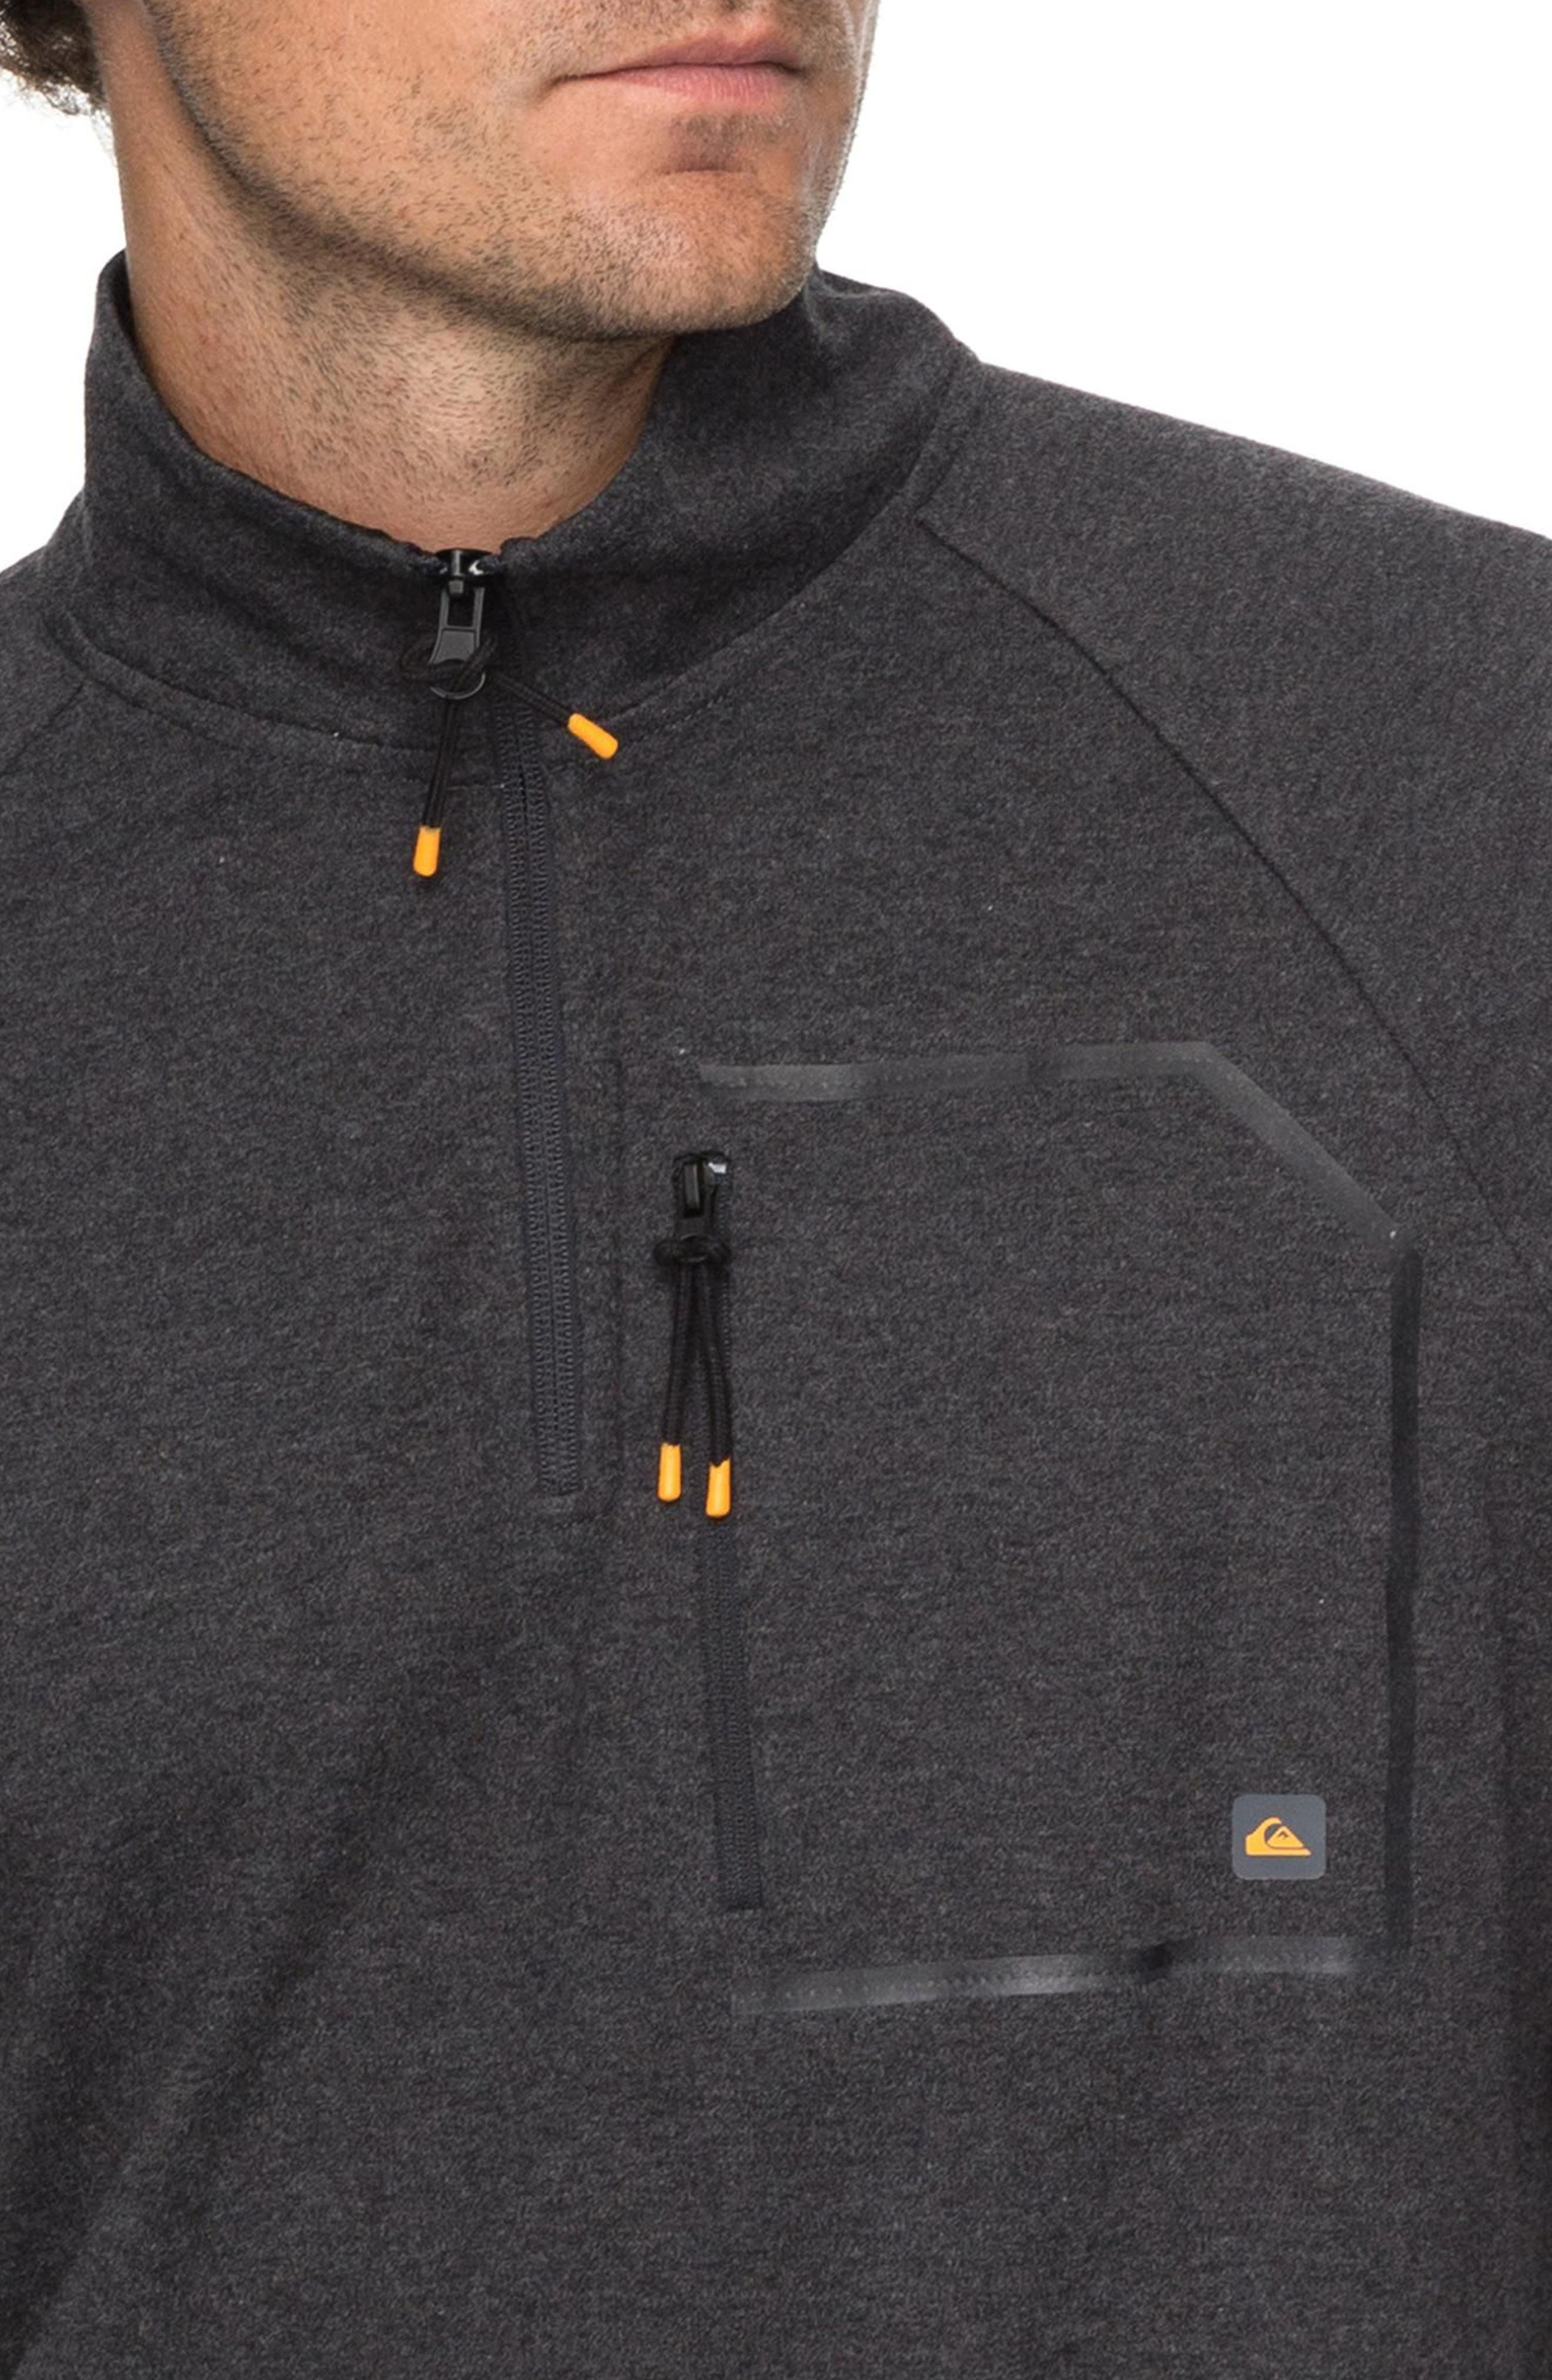 Technical Sweatshirt,                             Alternate thumbnail 4, color,                             005